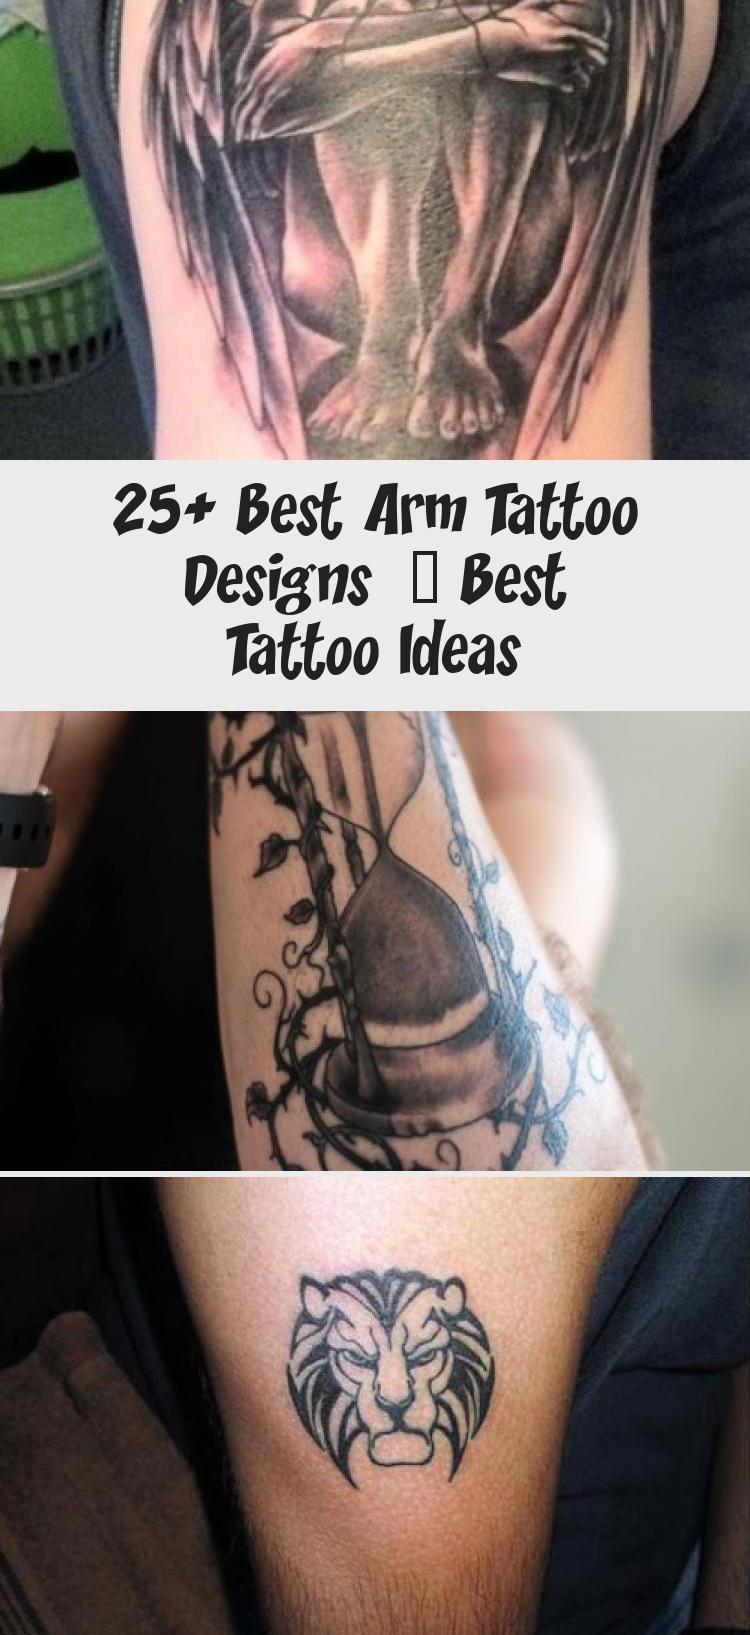 25 Best Arm Tattoo Designs Best Tattoo Ideas Buy Lehenga Choli Online Armtattoosformenmandala Tradition In 2020 Cool Arm Tattoos Arm Tattoo Arm Tattoos For Guys